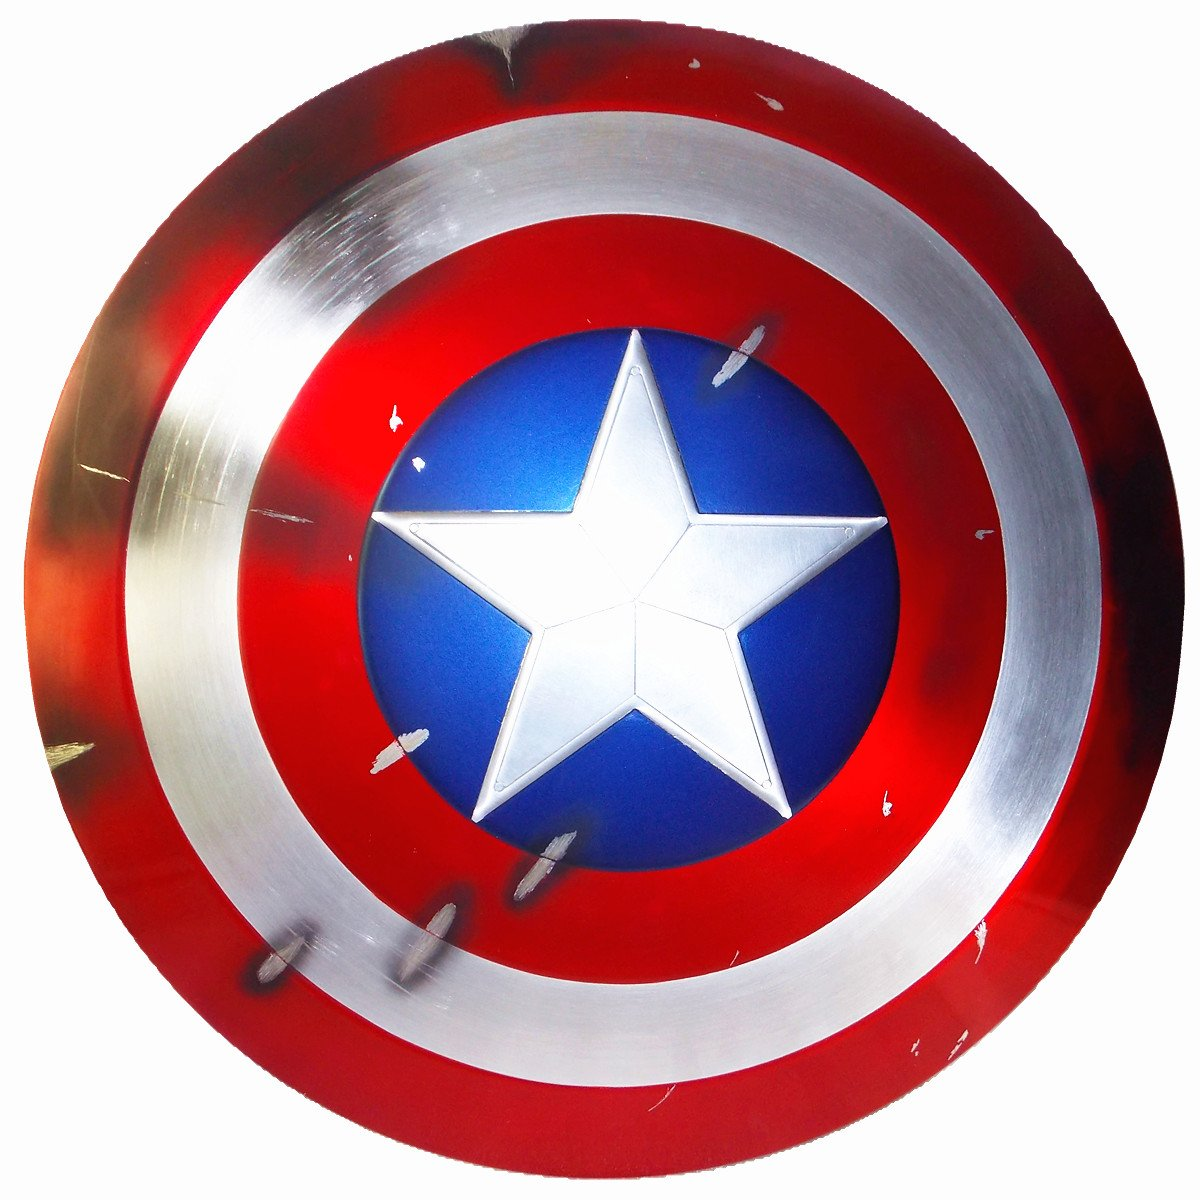 Gmasking Aluminum Alloy Captain America Adult Shield 1:1 Replica+Adjustable Strap